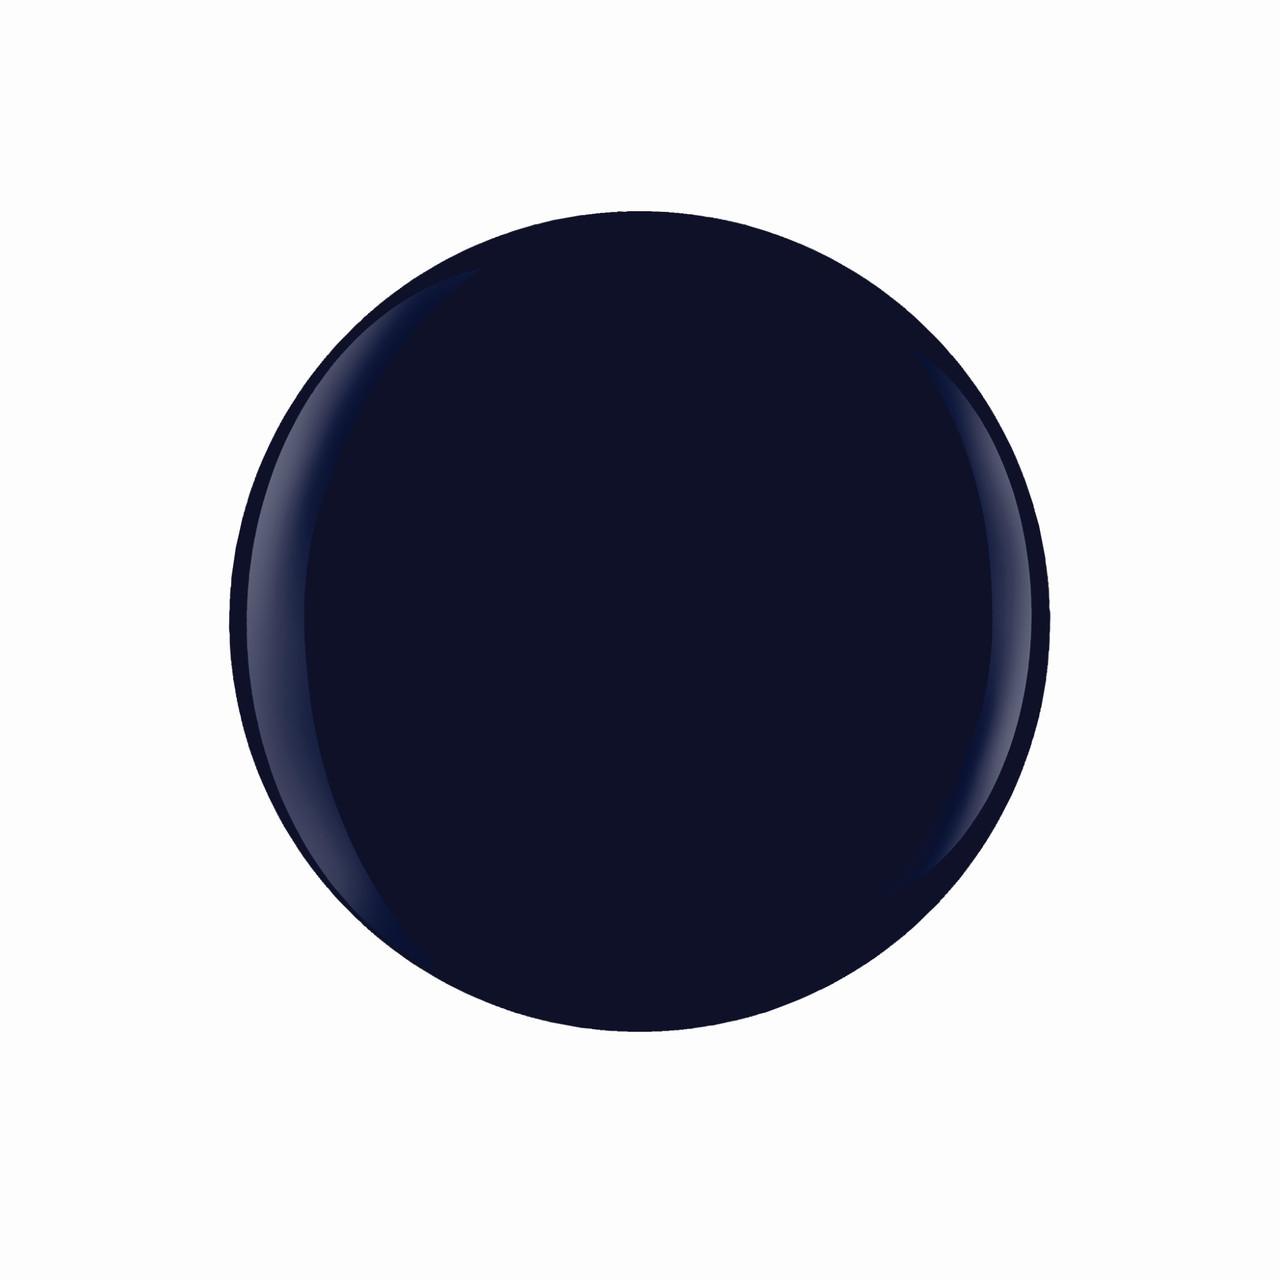 "Gelish Xpress Dip ""Laying Low"" - Rich Navy Blue Crème - 43g   1.5 oz."